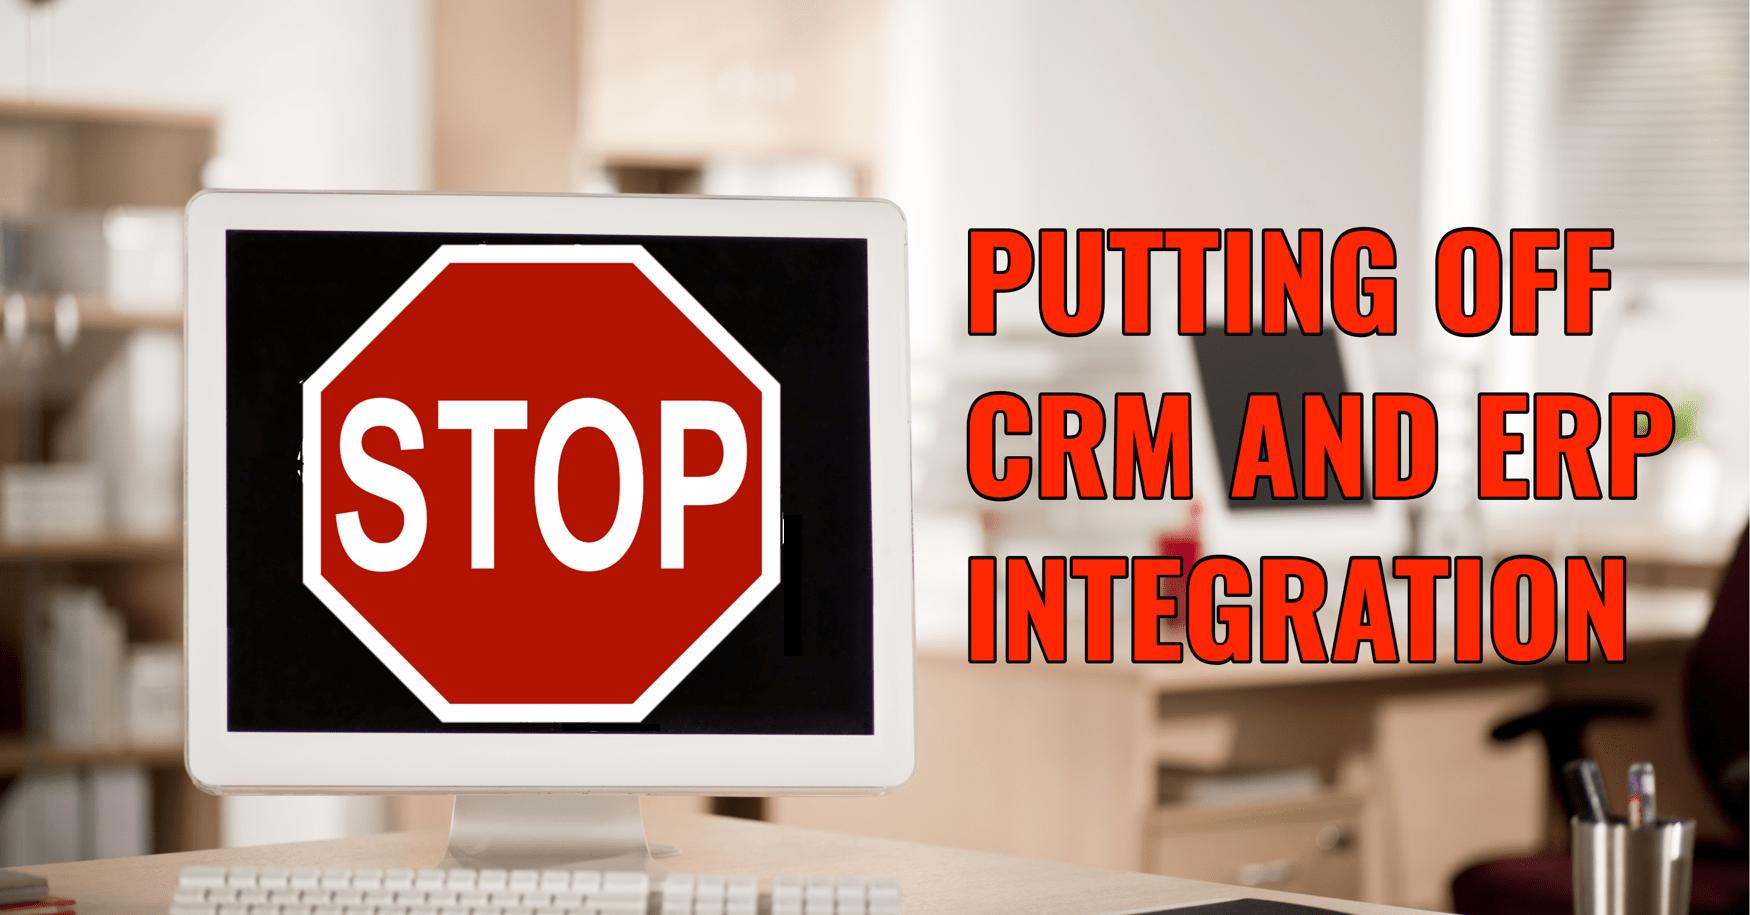 Put Off CRM ERP Integration